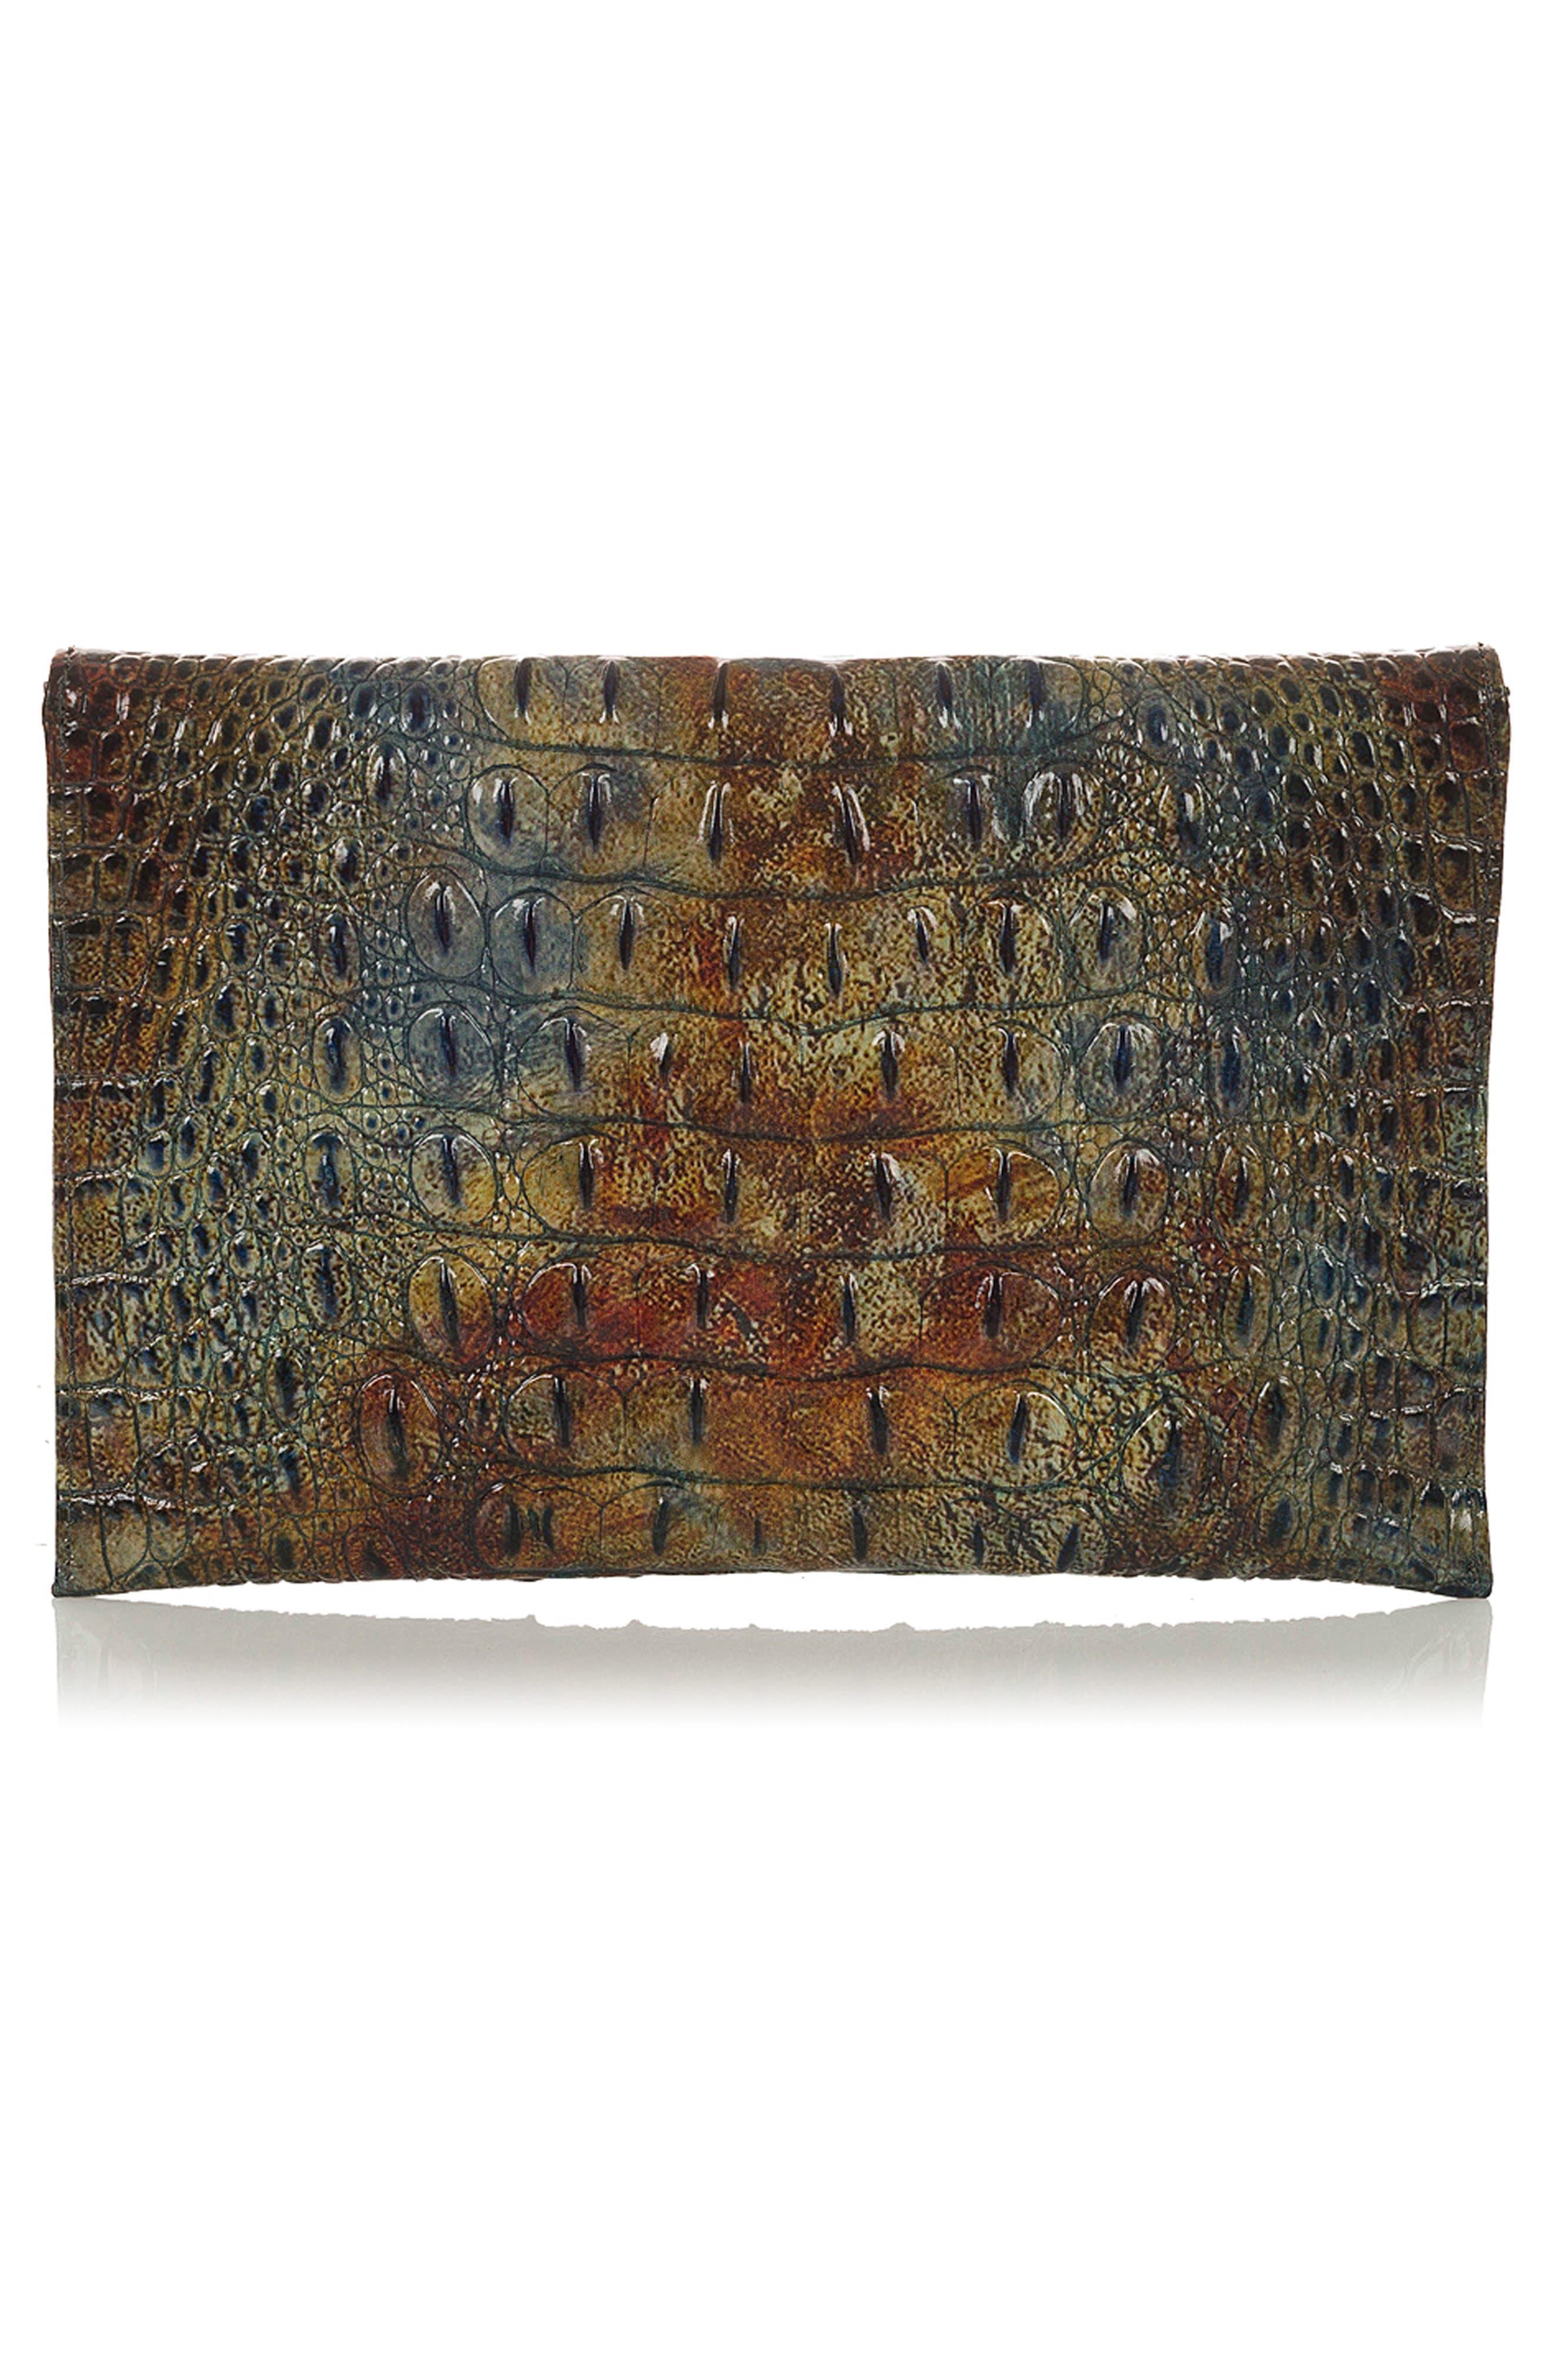 BRAHMIN,                             Melbourne Croc Embossed Leather Envelope Clutch,                             Alternate thumbnail 2, color,                             204